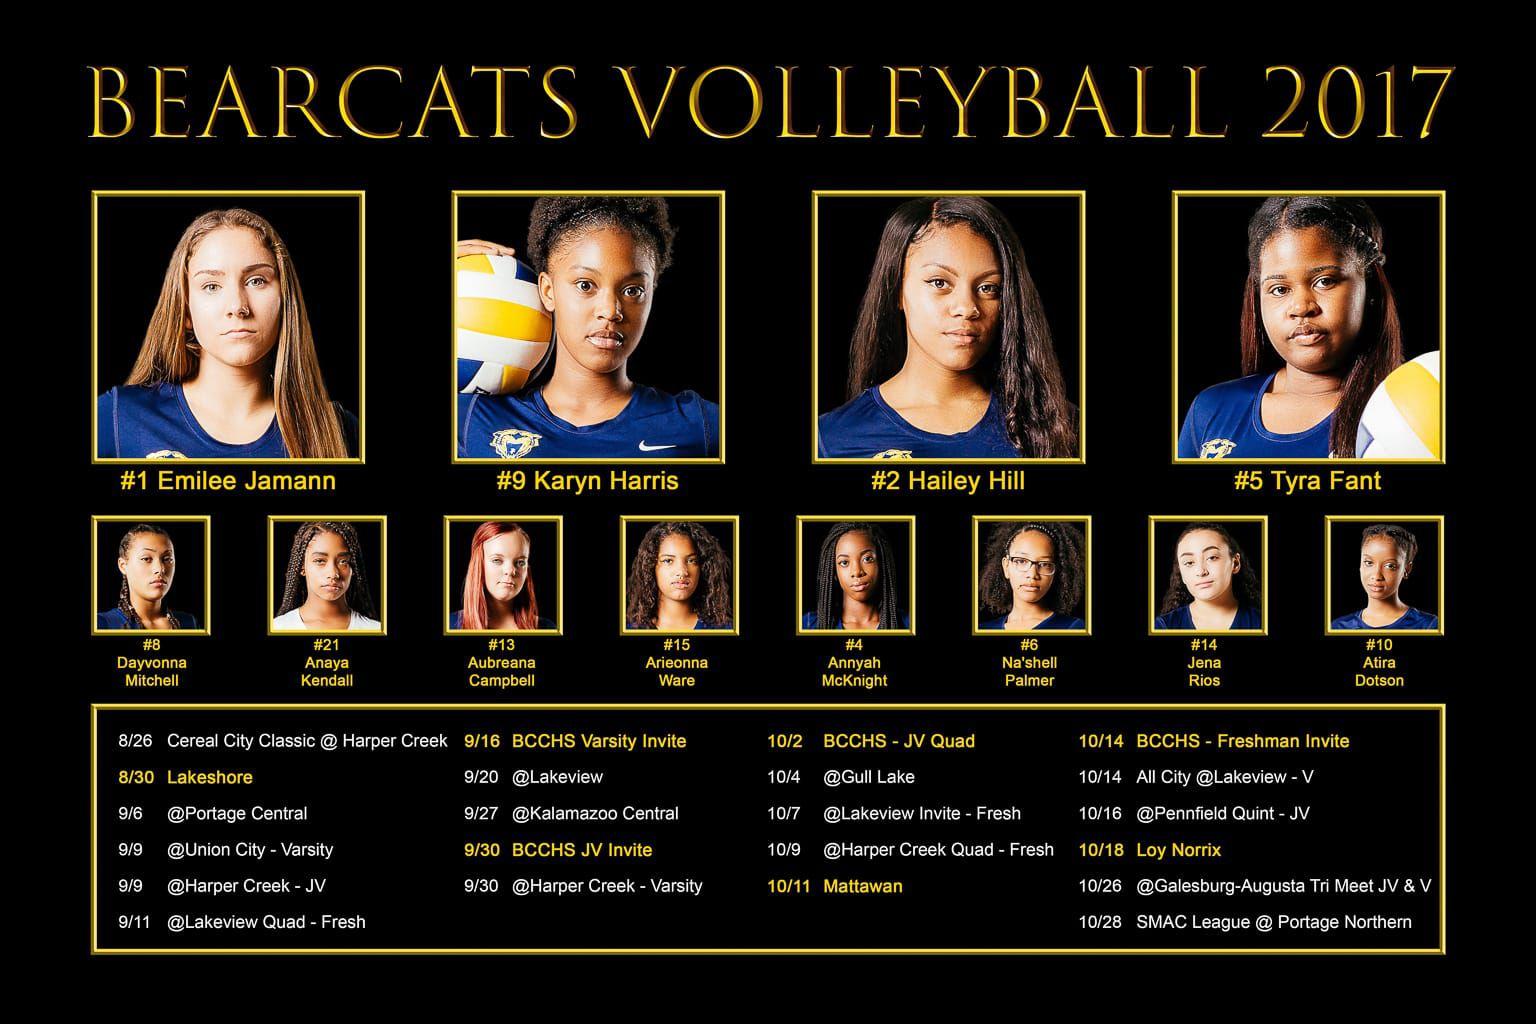 Bearcats Volleyball 2017